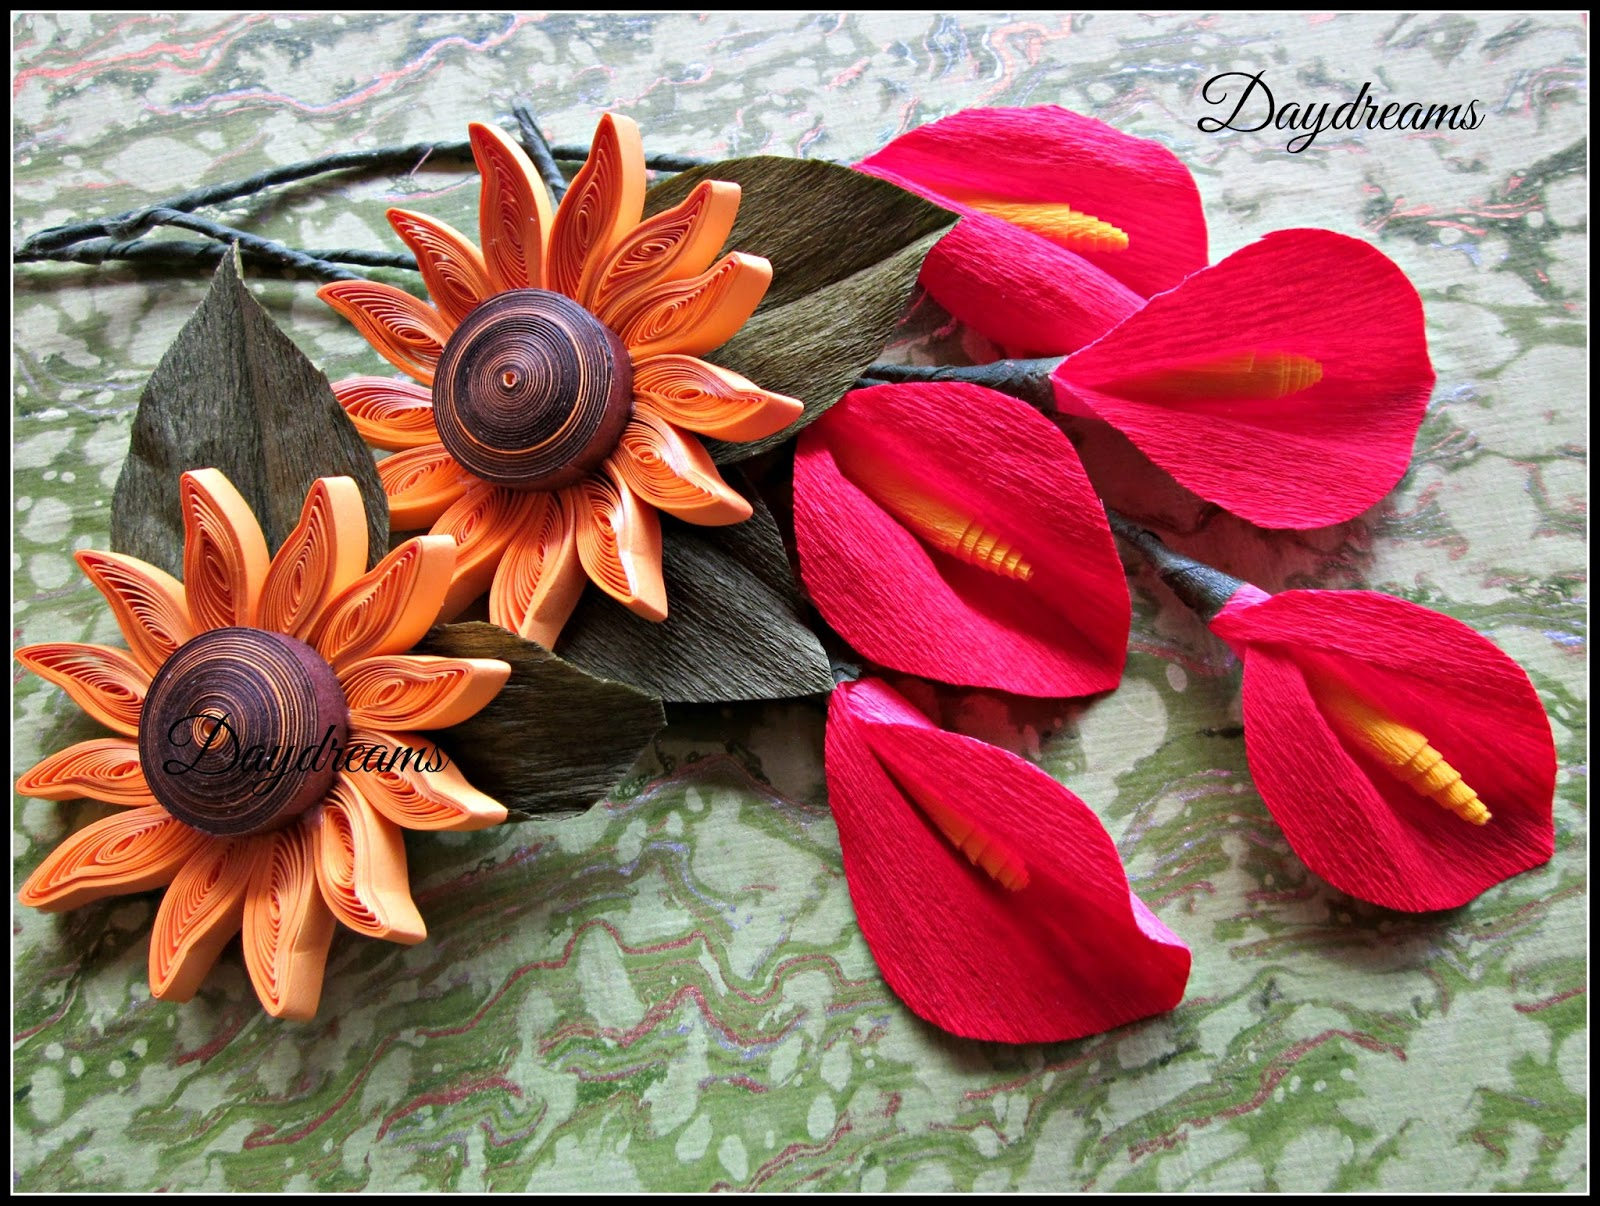 Daydreams wedding plates with quilling for Arathi thattu decoration